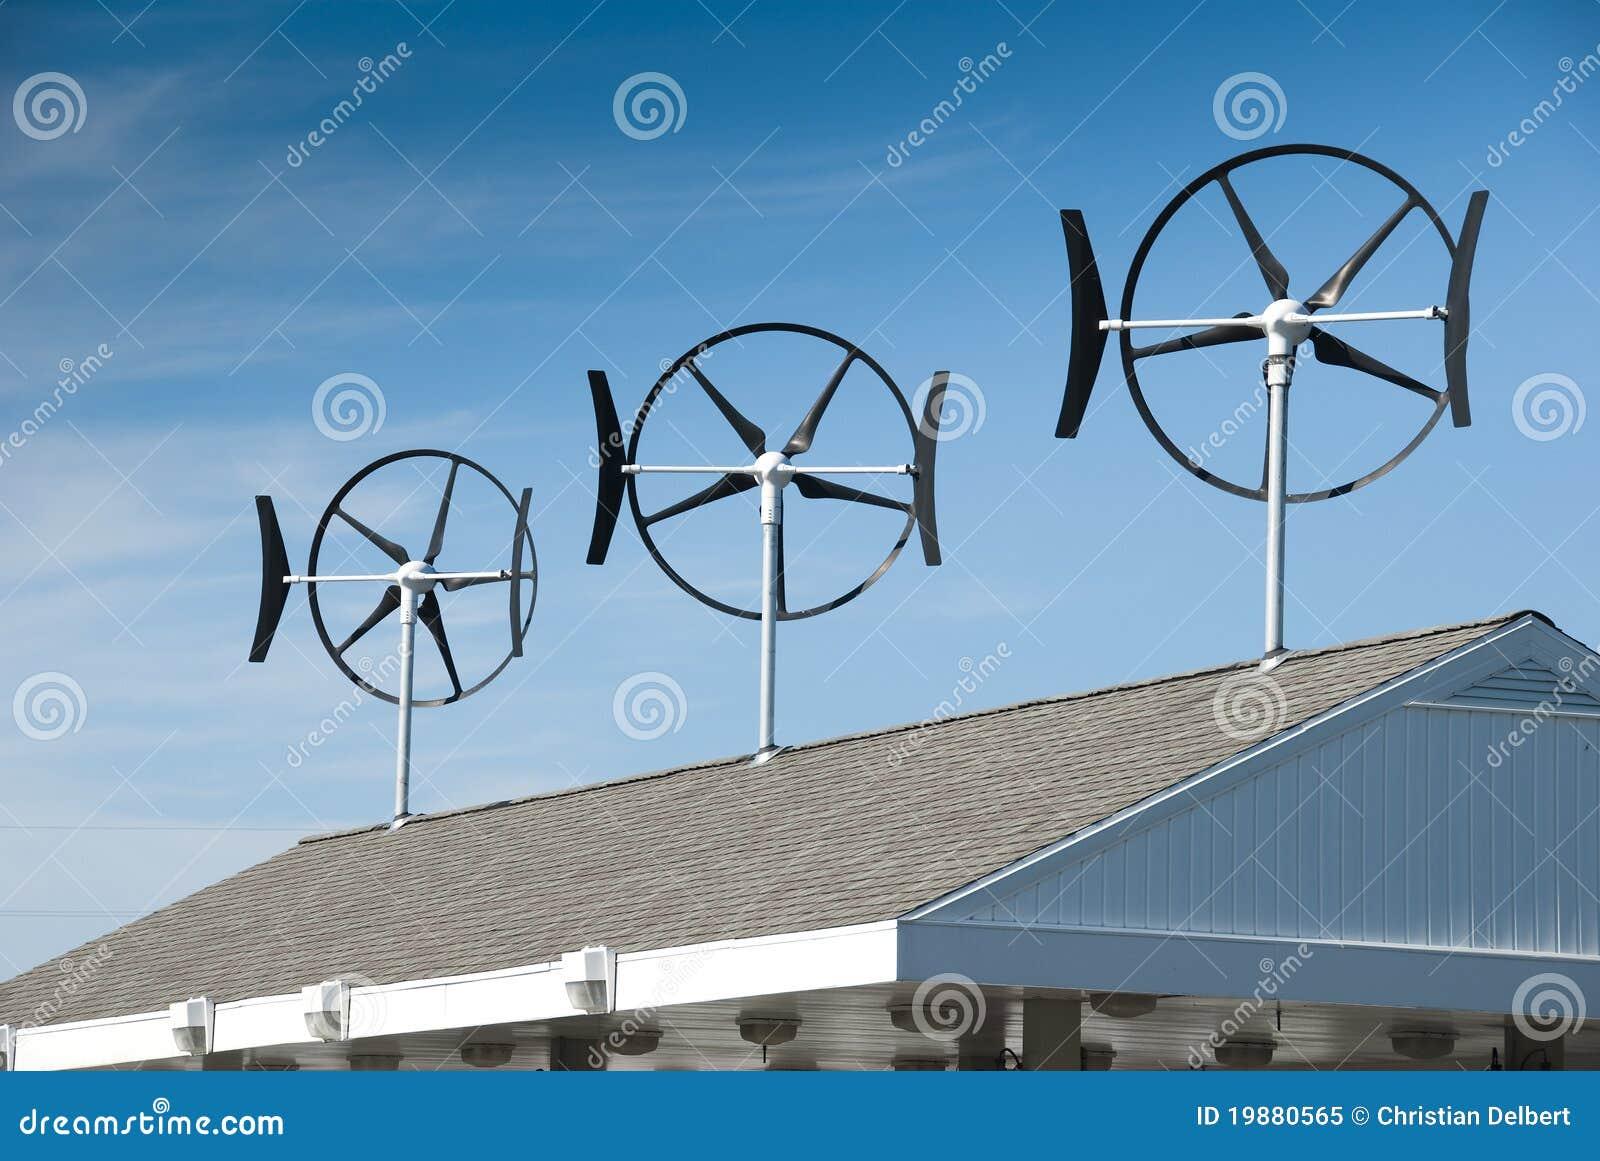 Liten turbinwind